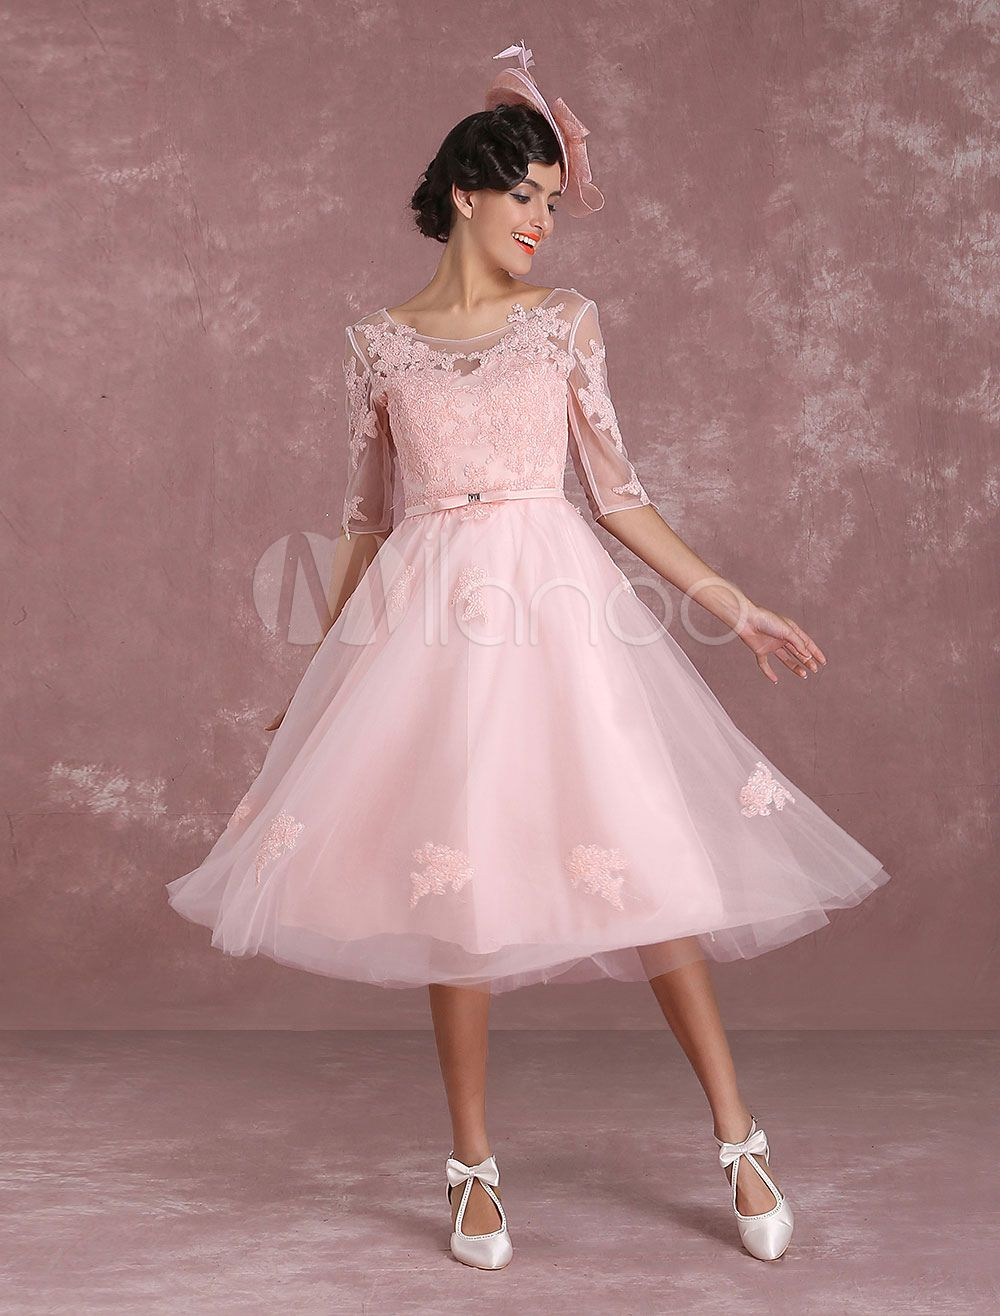 Short Wedding Dresses 2017 Vintage Soft Pink Bridal Gown Lace Applique Illusion Half Sleeve Tea Length Dress With Bow Sash: Soft Pink Vintage Wedding Dresses At Reisefeber.org